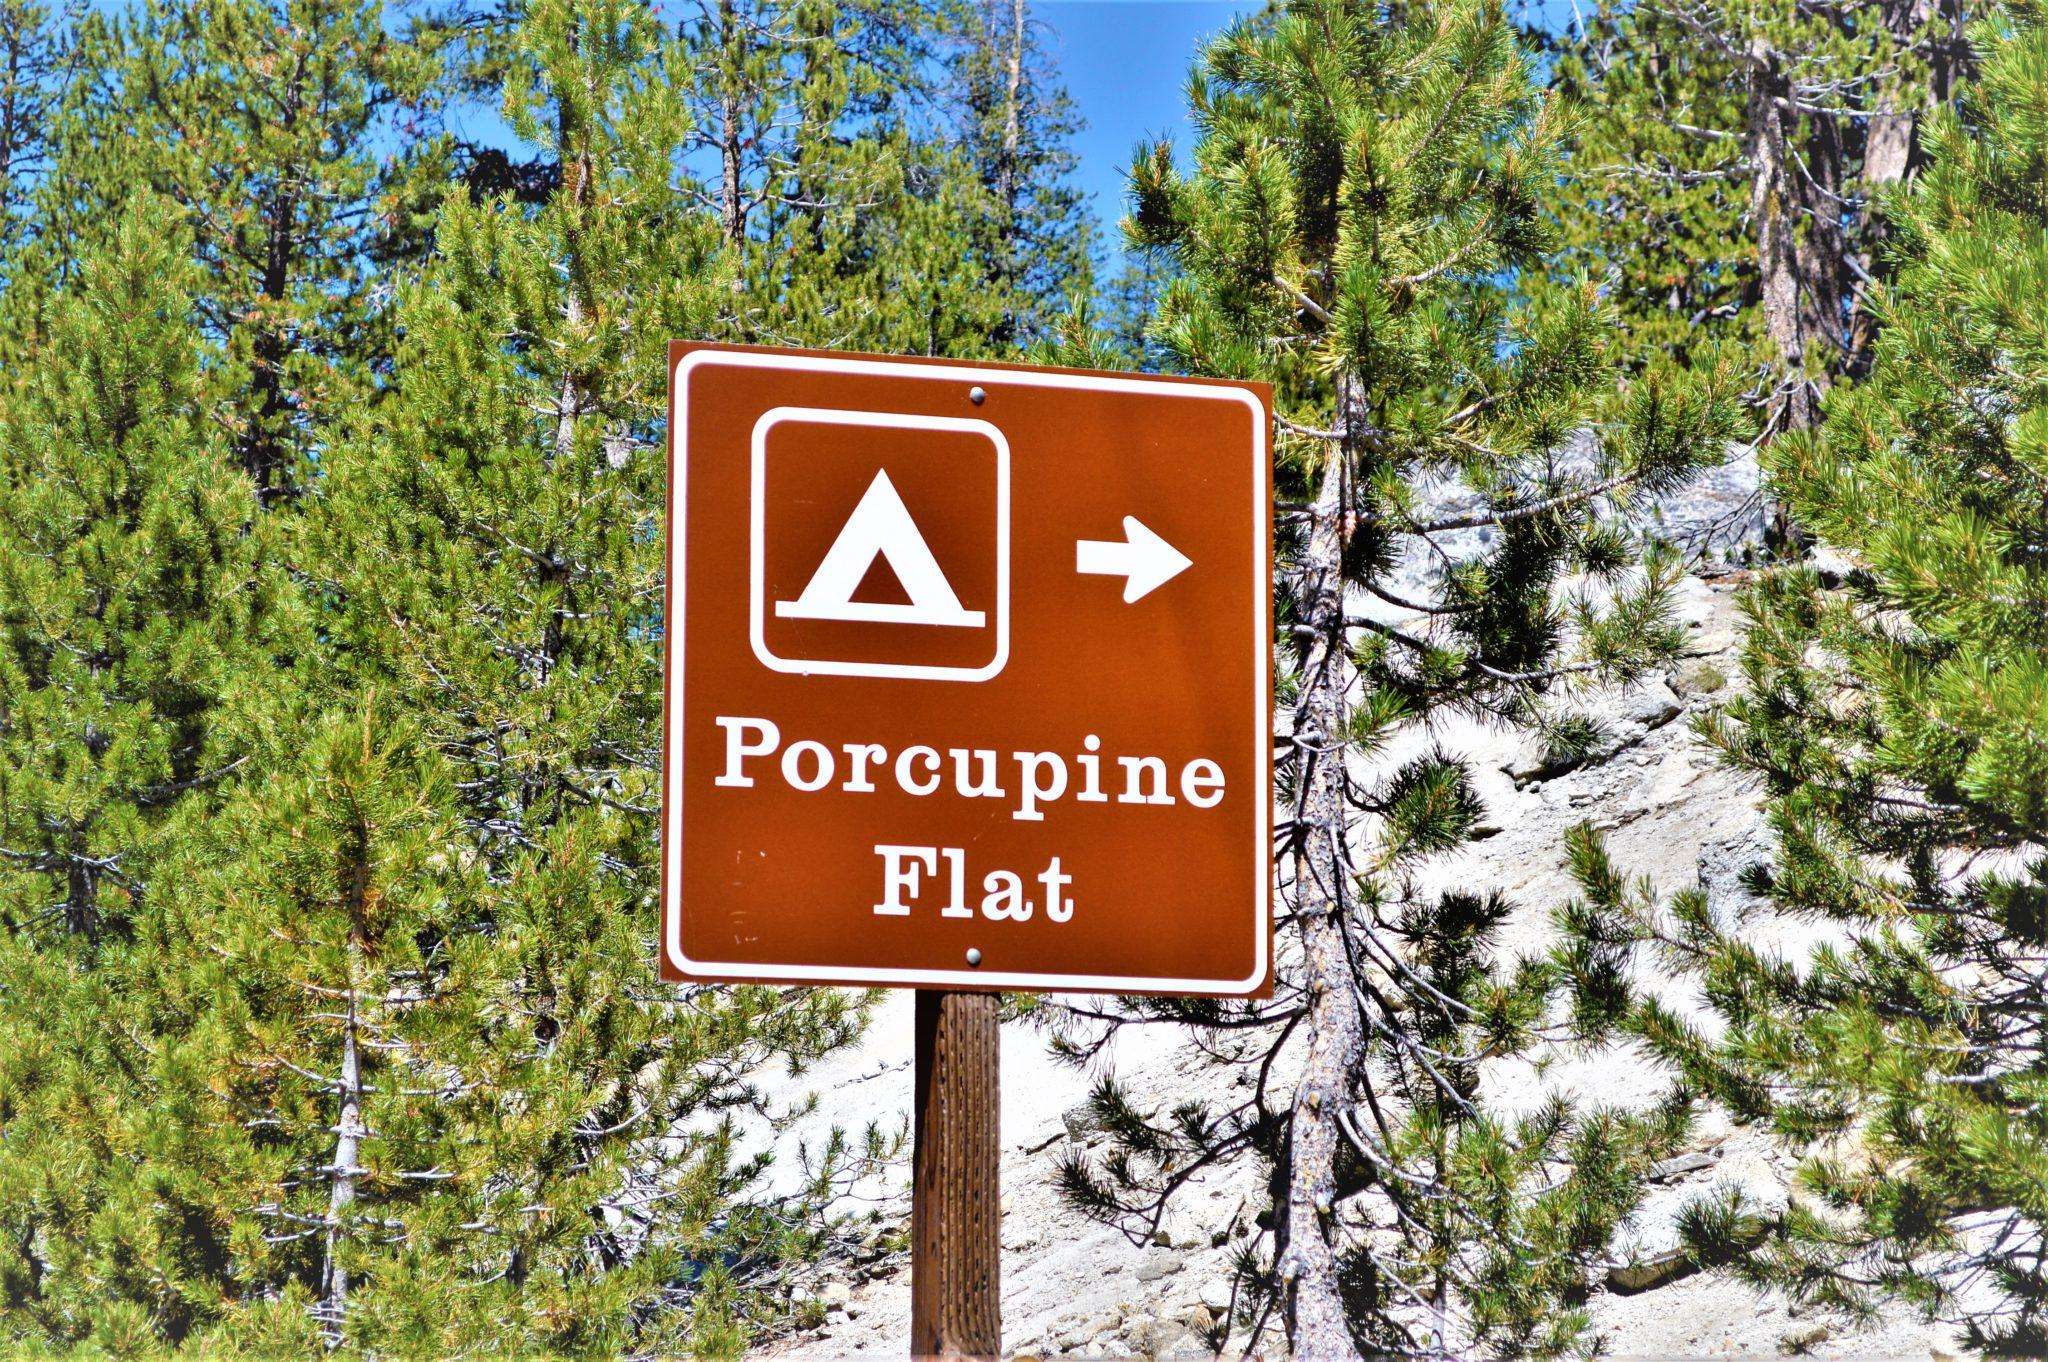 Porcupine Flat Camping sign, Yosemite